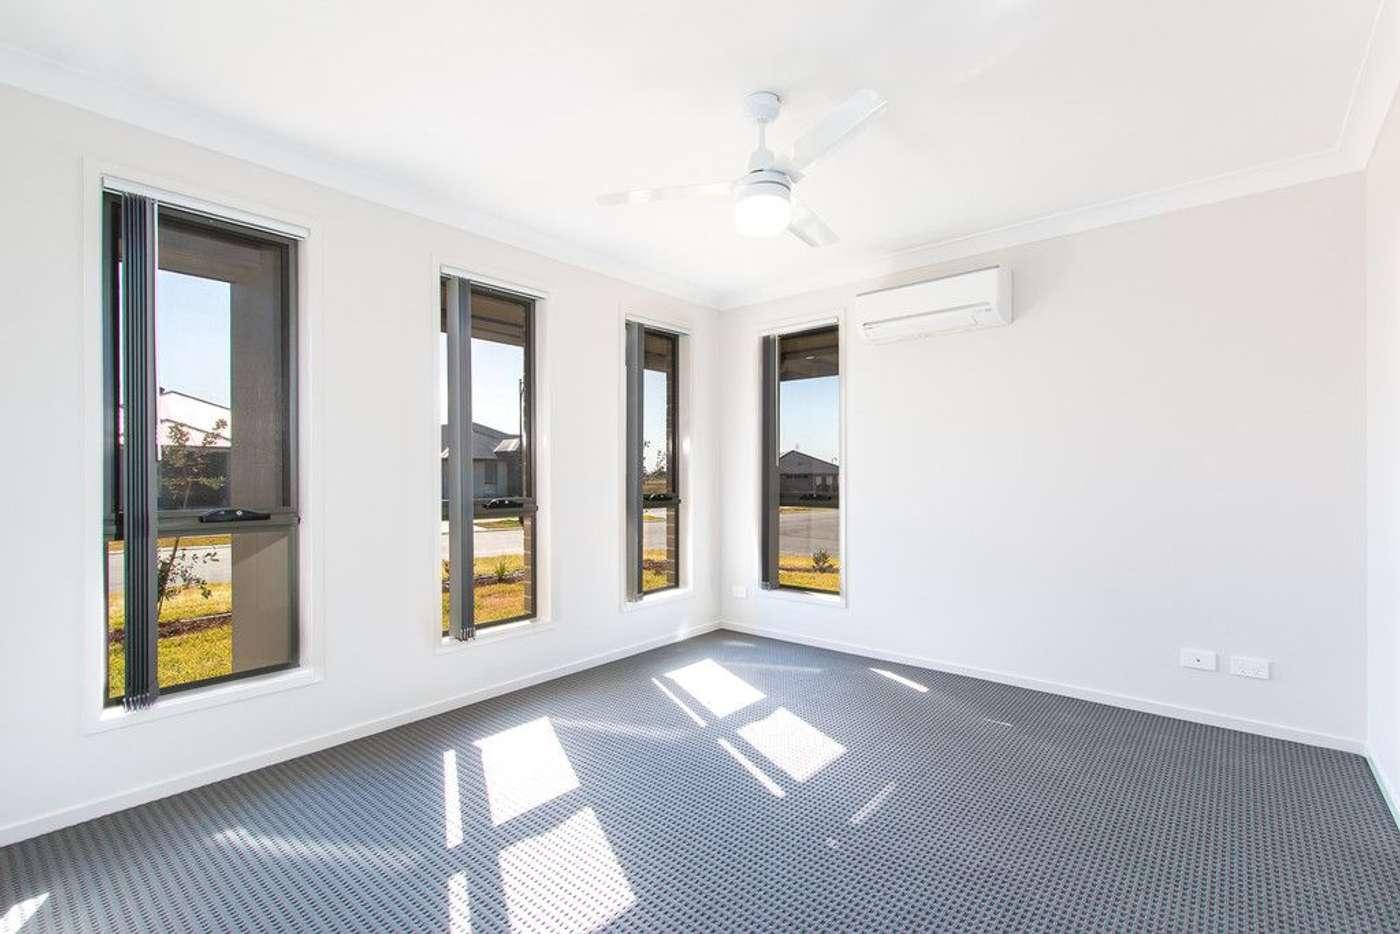 Seventh view of Homely house listing, 11 McNamara Street, Thornton NSW 2322